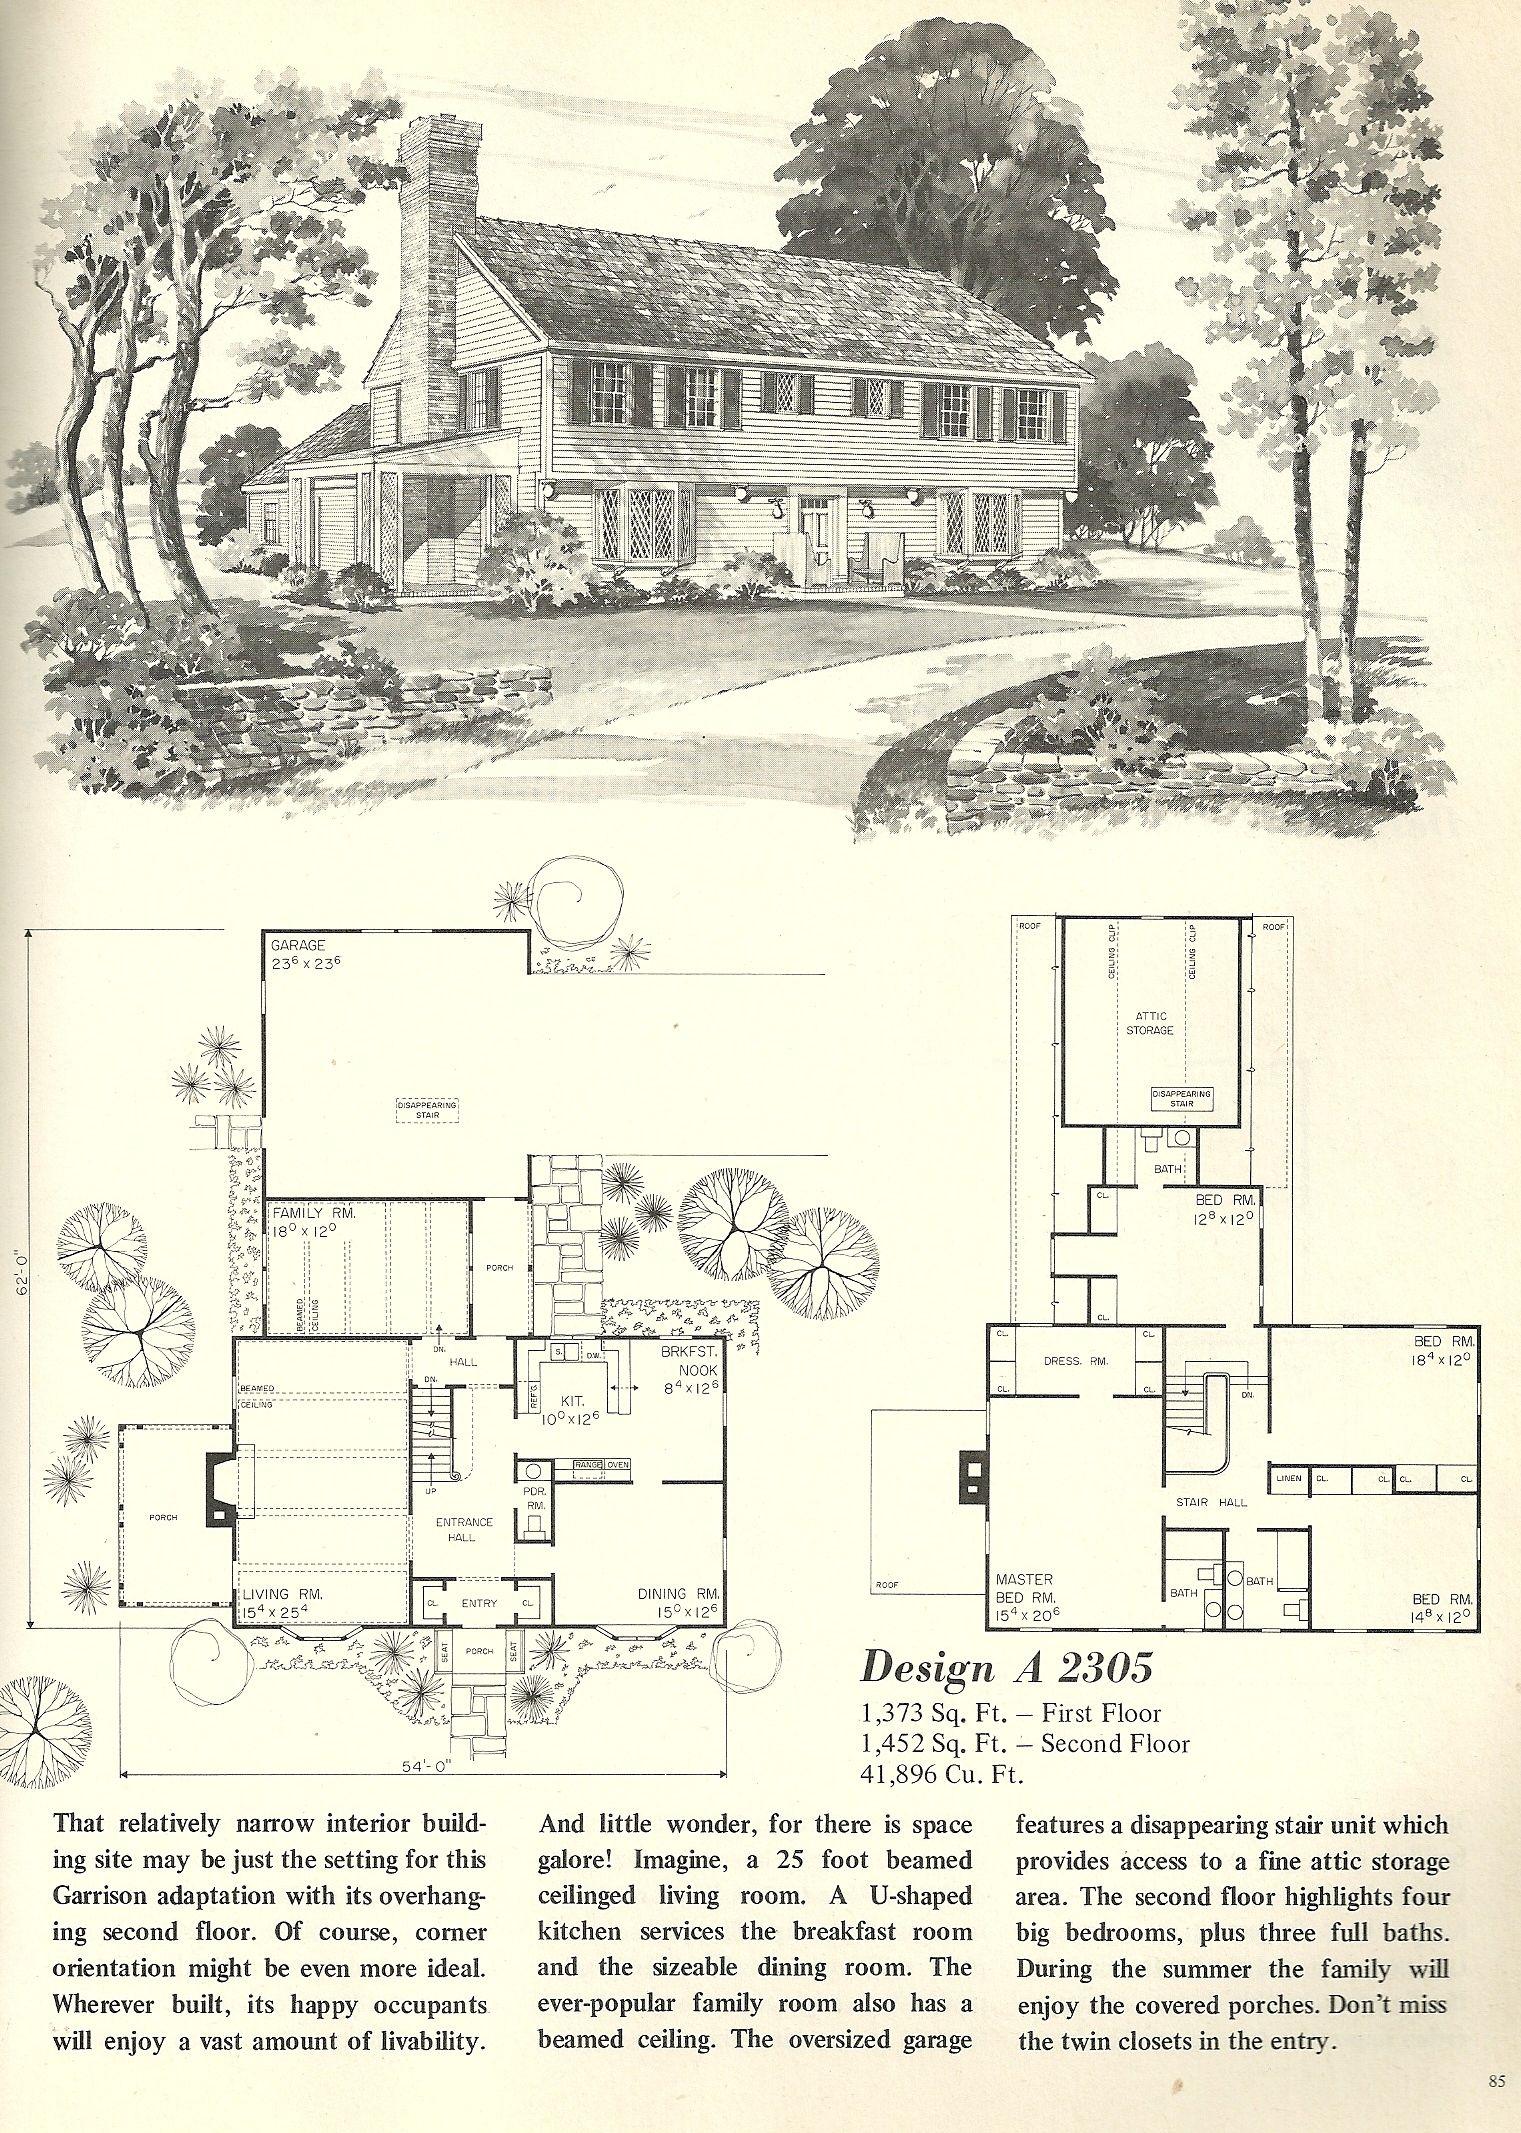 Vintage House Plans 2305 Vintage House Plans House Plans